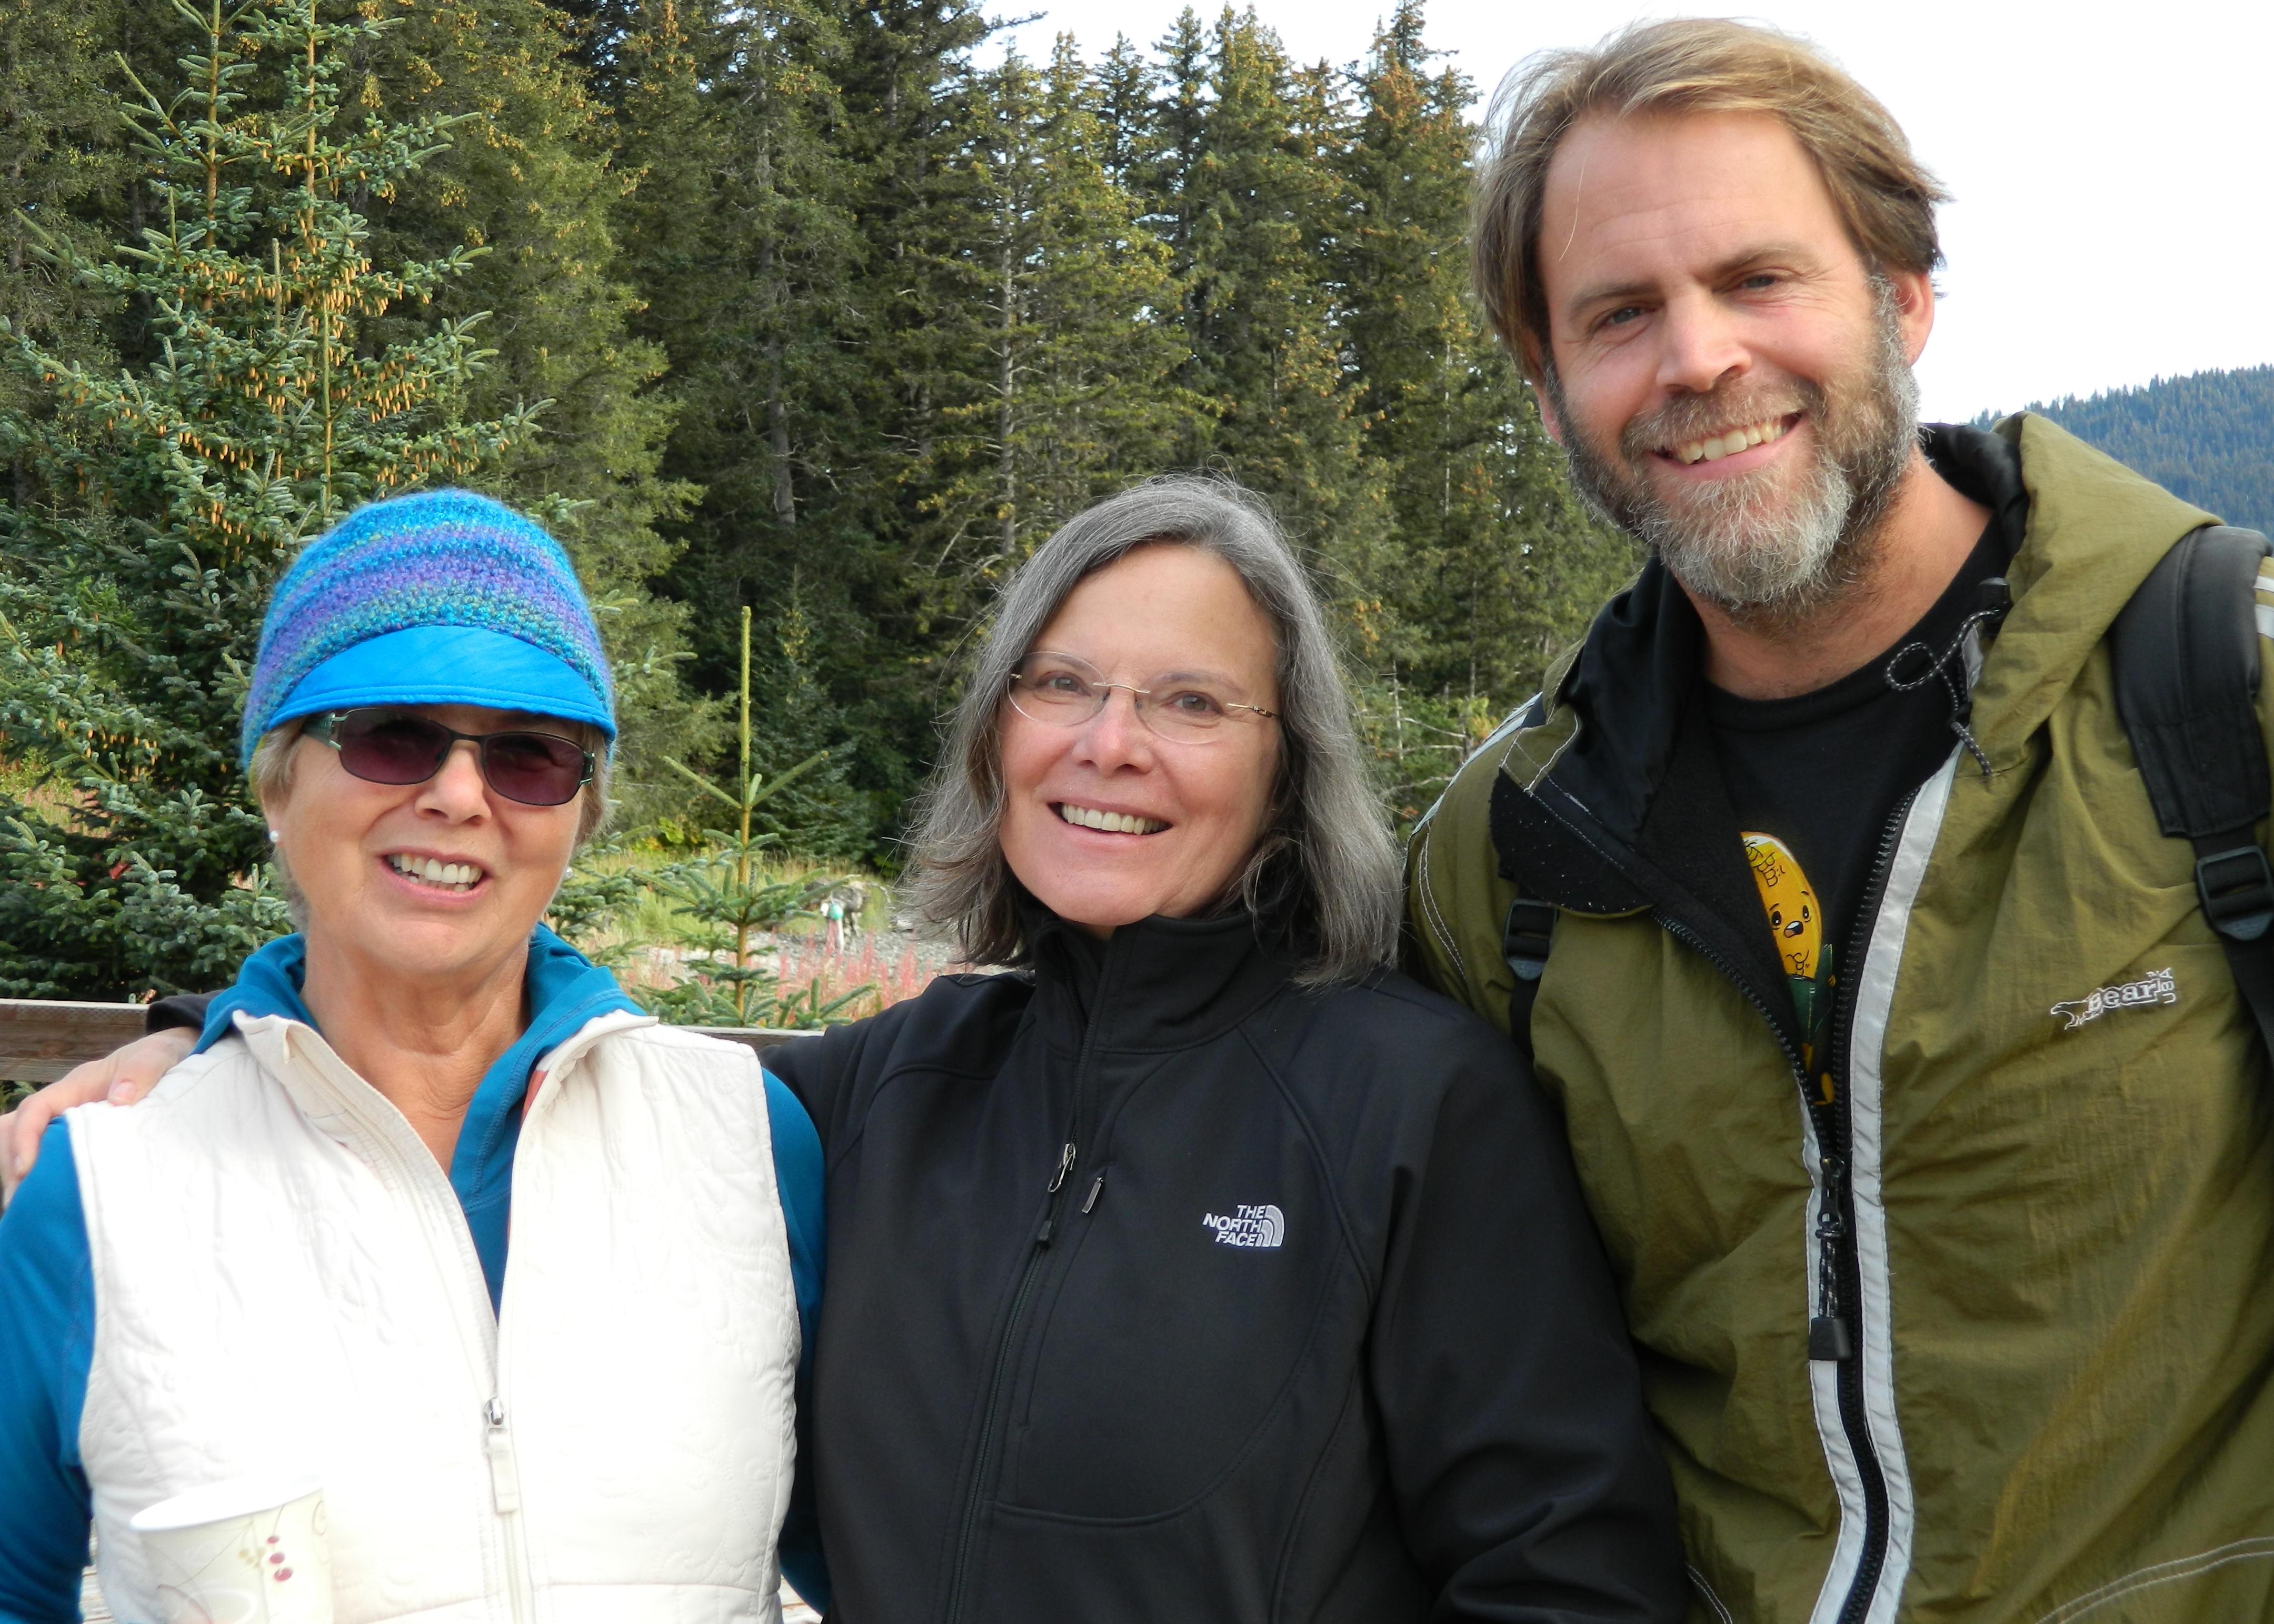 Linda Martin, Carolyn Forche, and Chris Baron